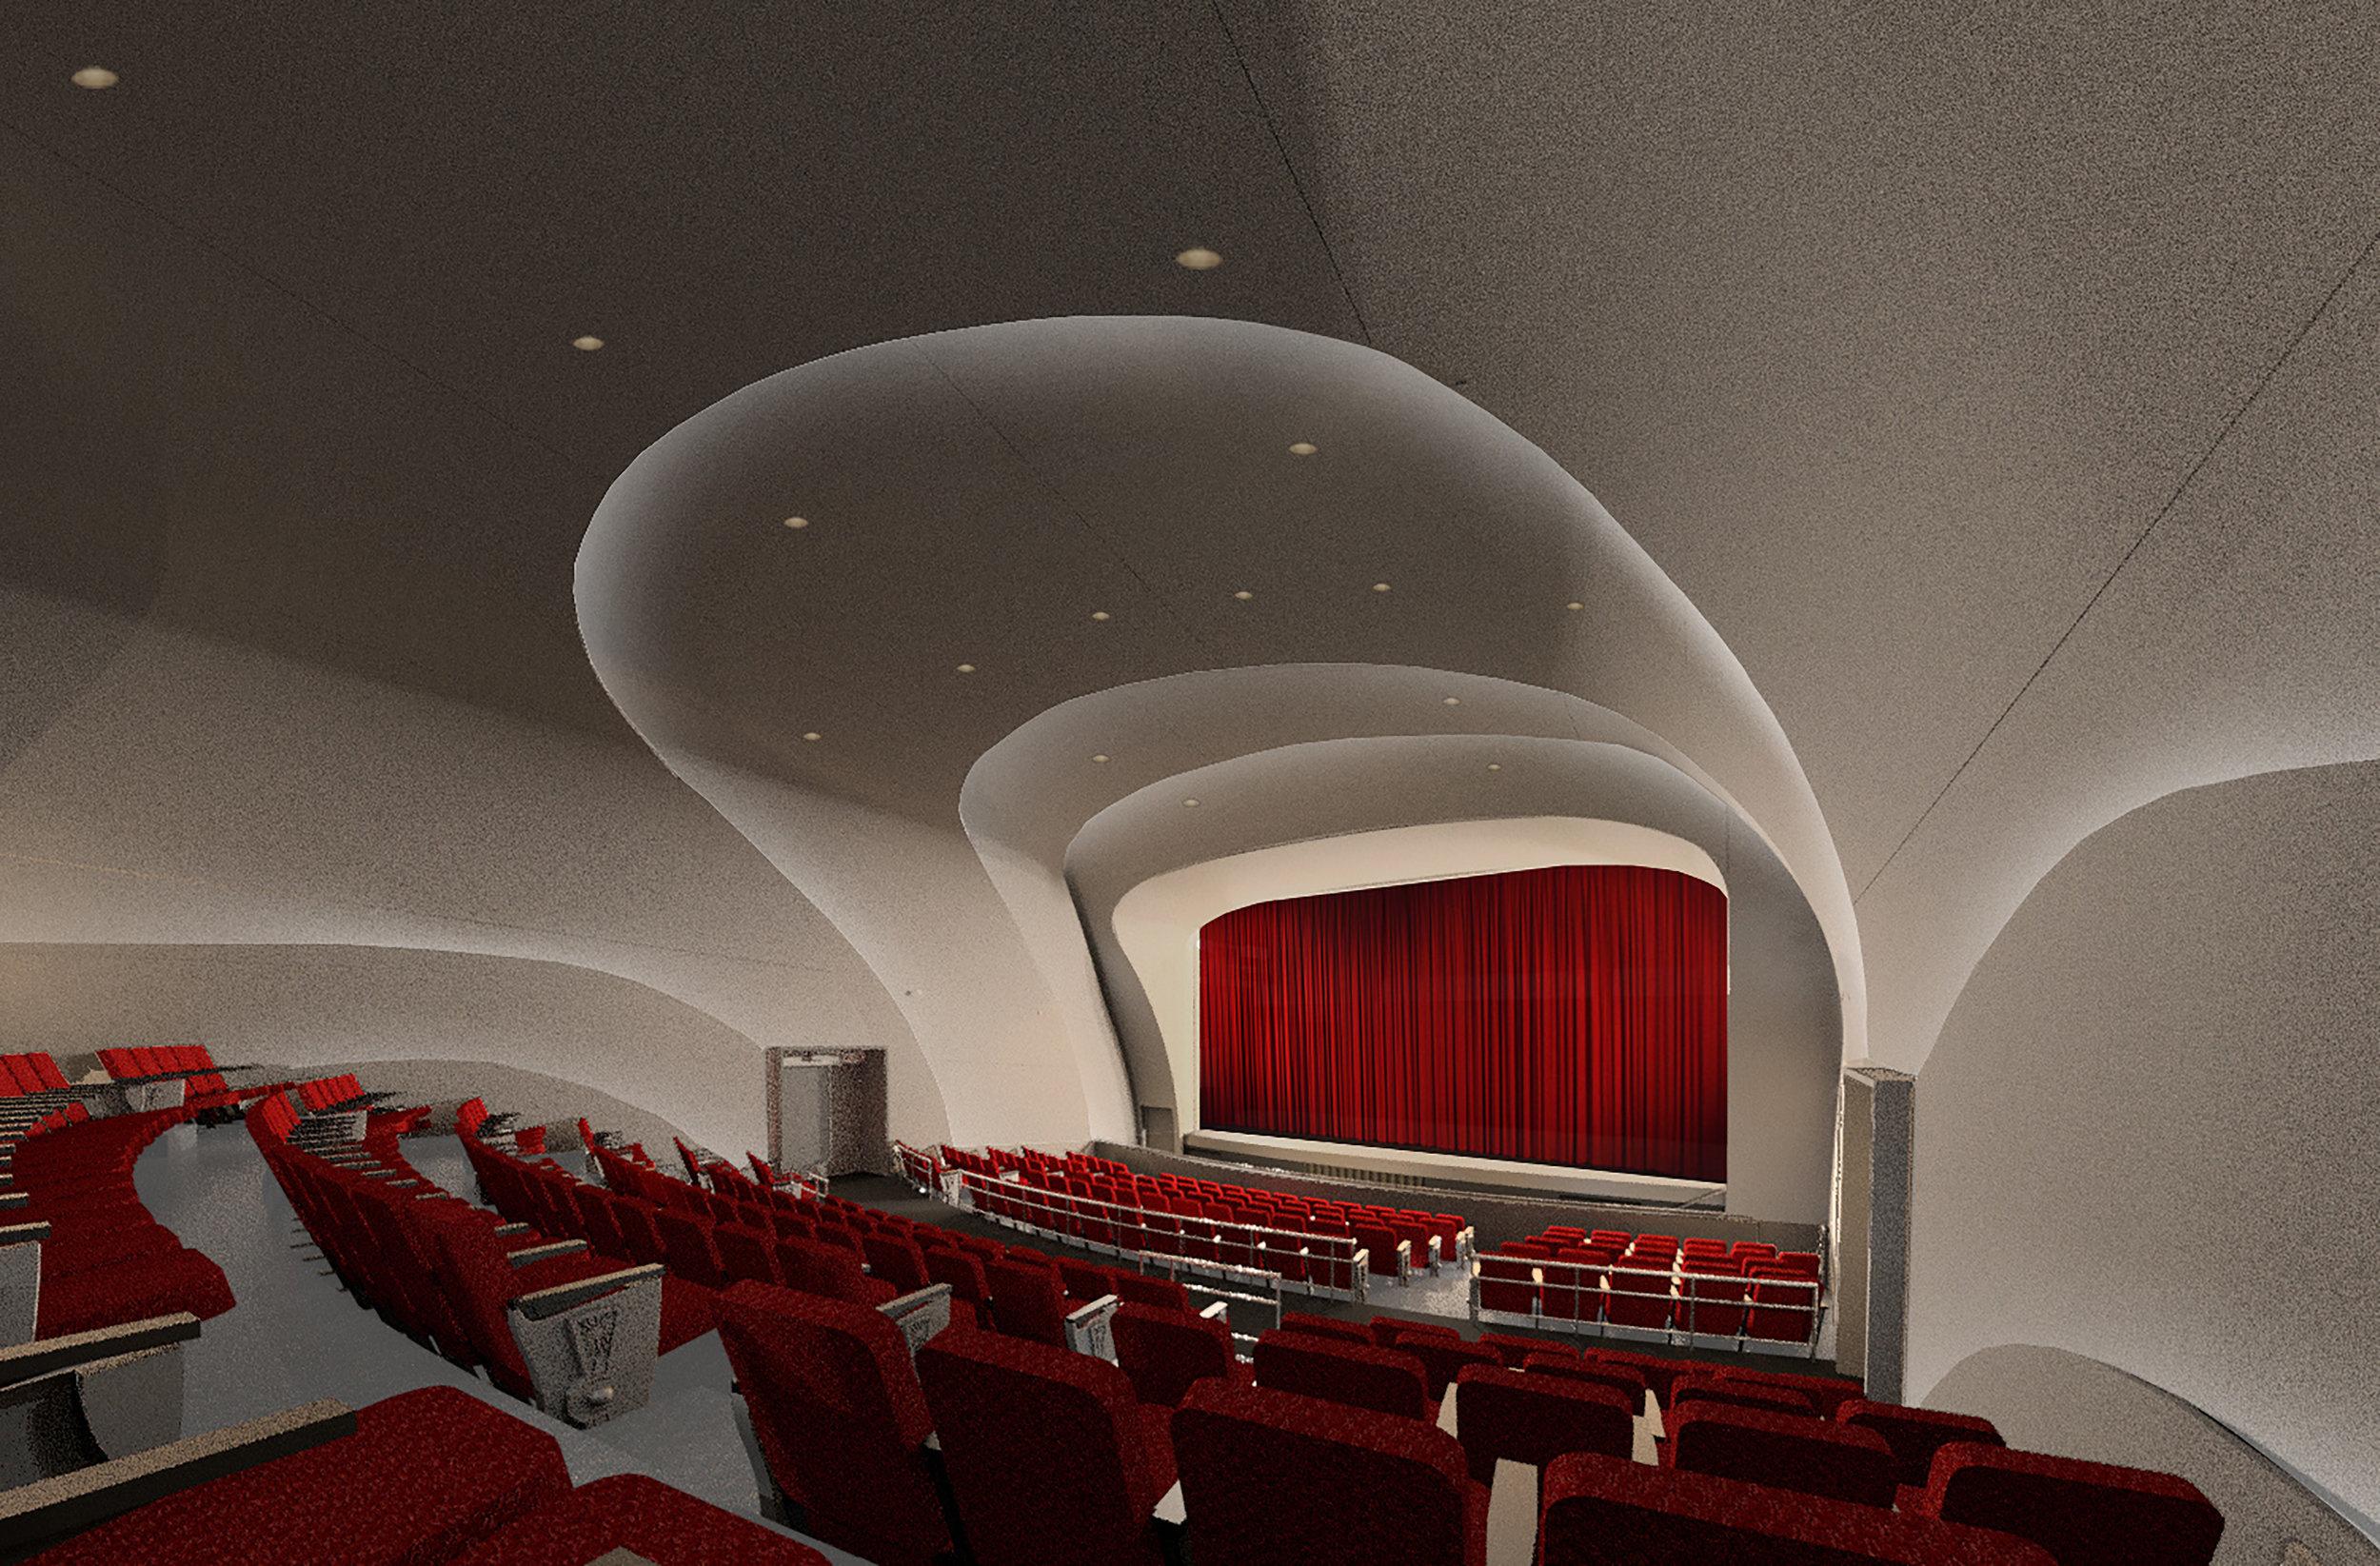 7 Theater_Photoshopped_300dpi.jpg